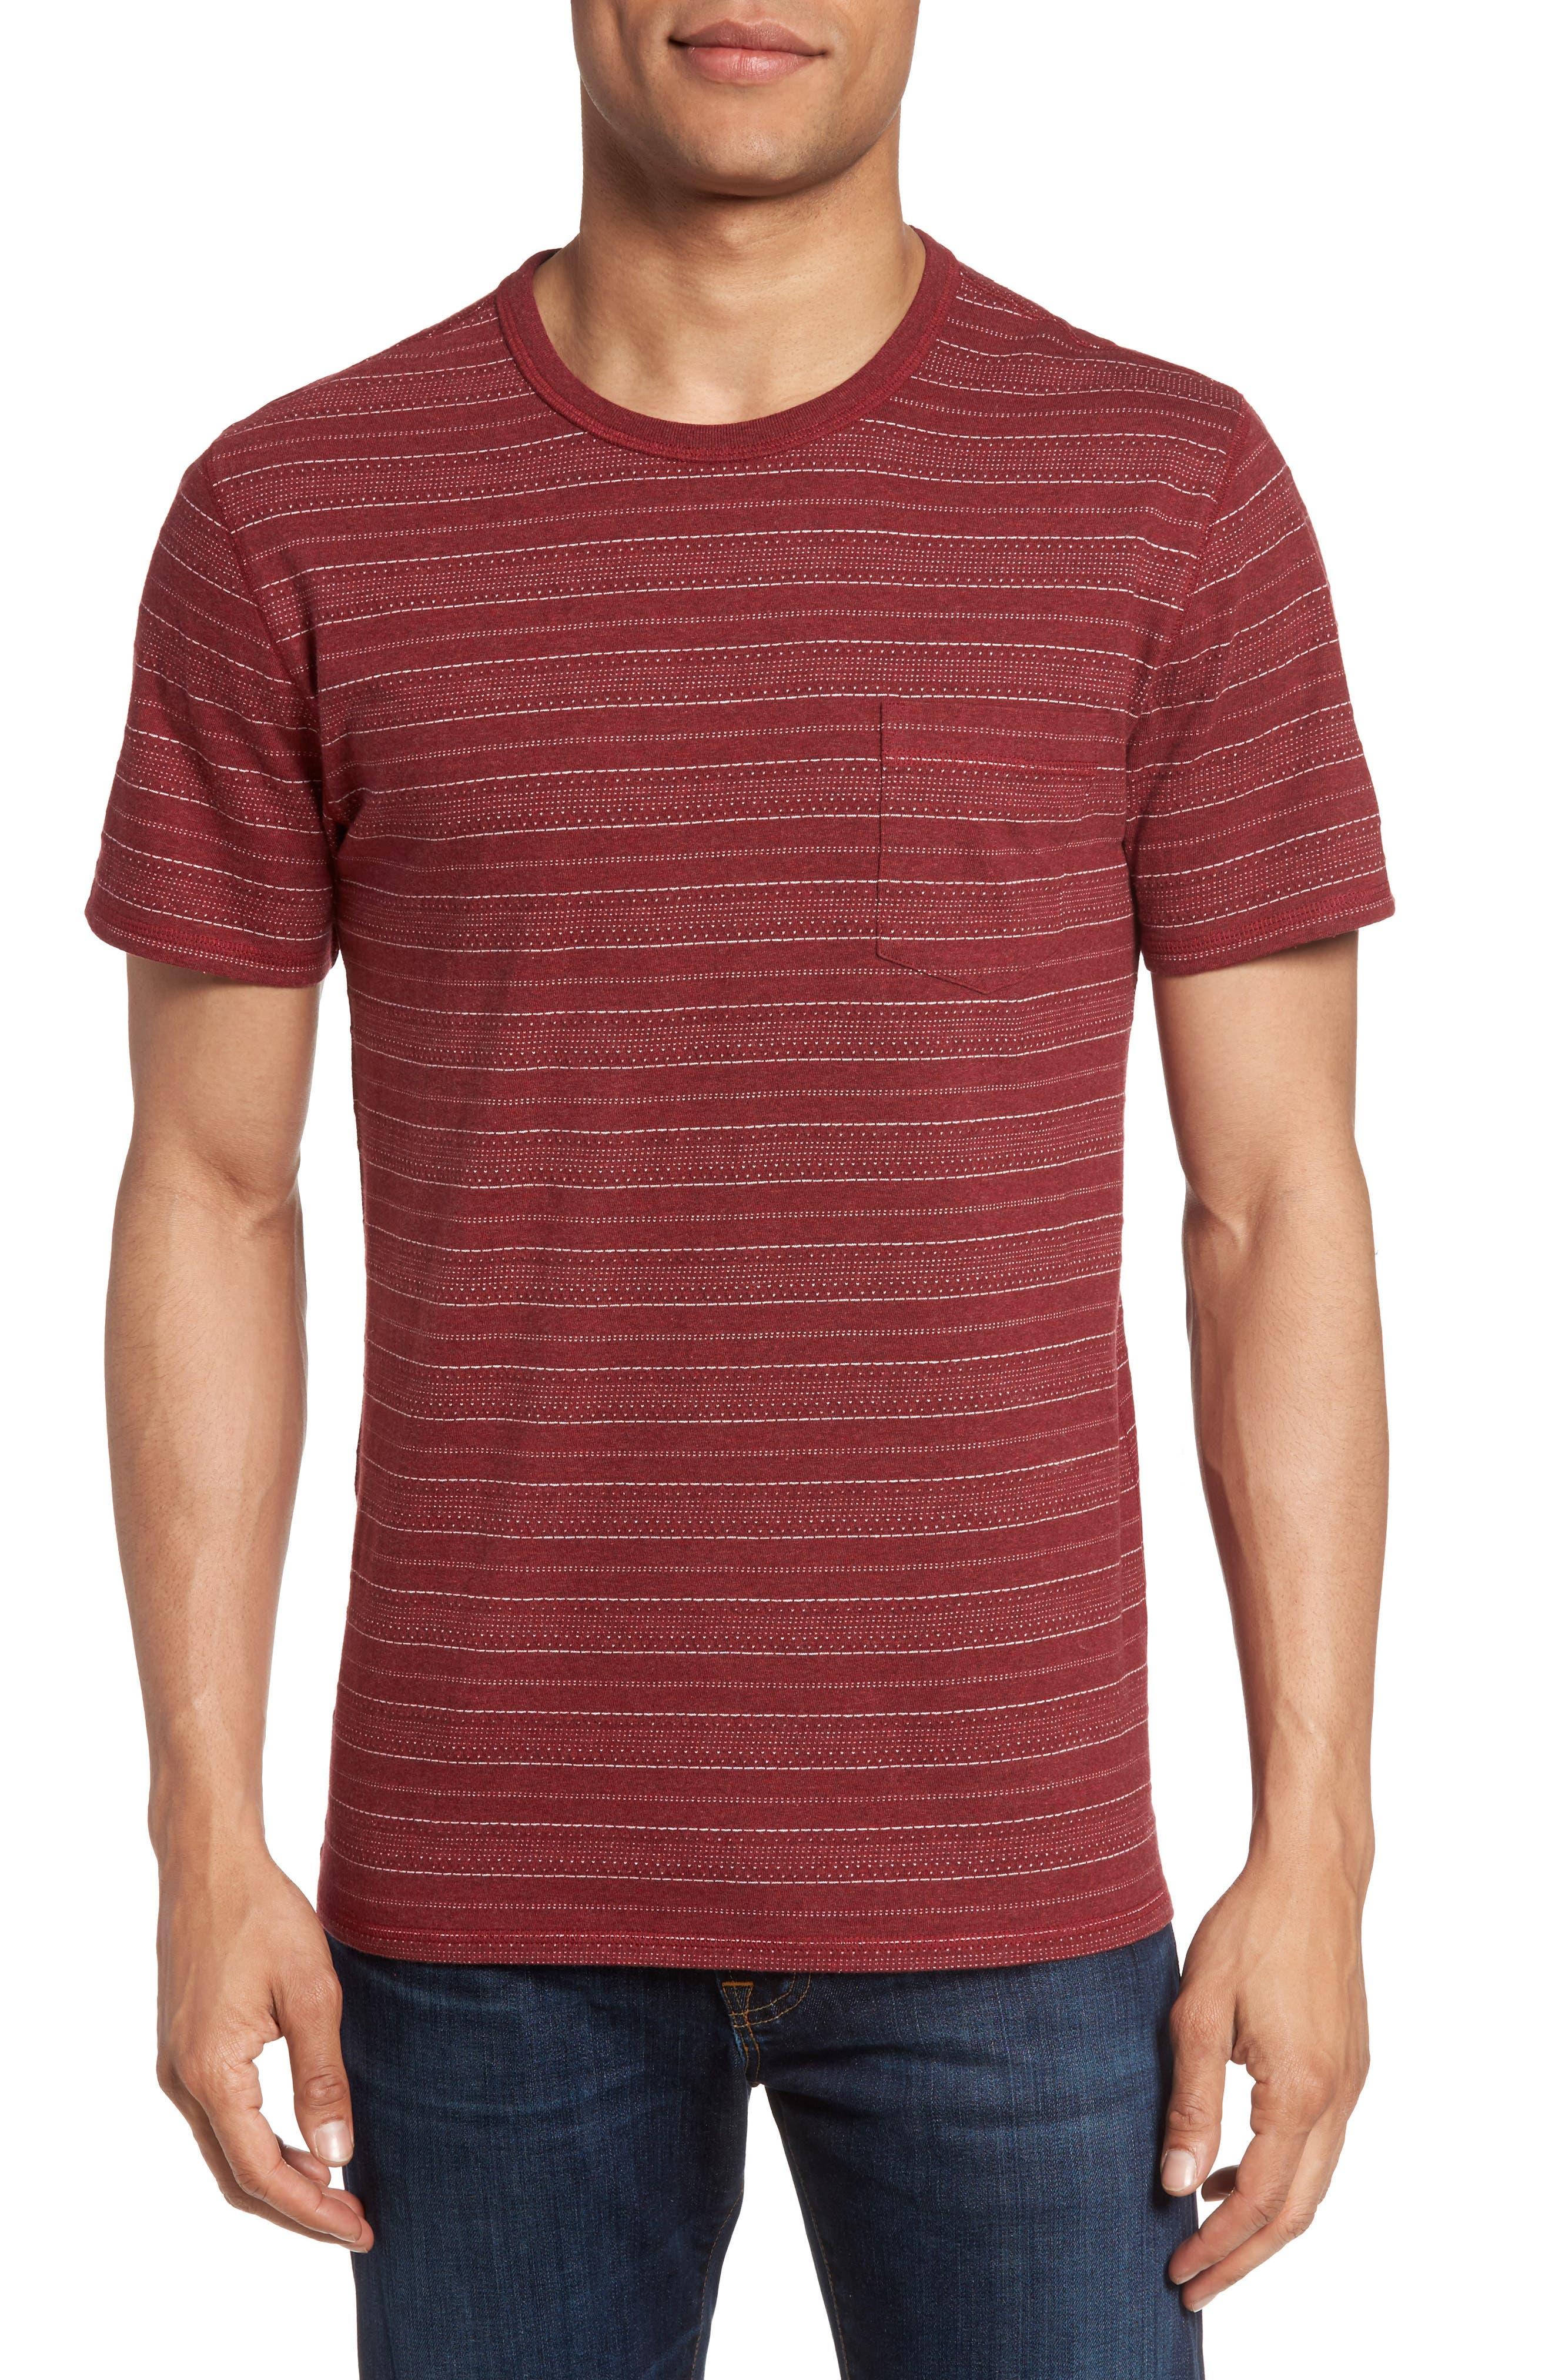 Main Image - 1901 Jacquard Stripe T-Shirt